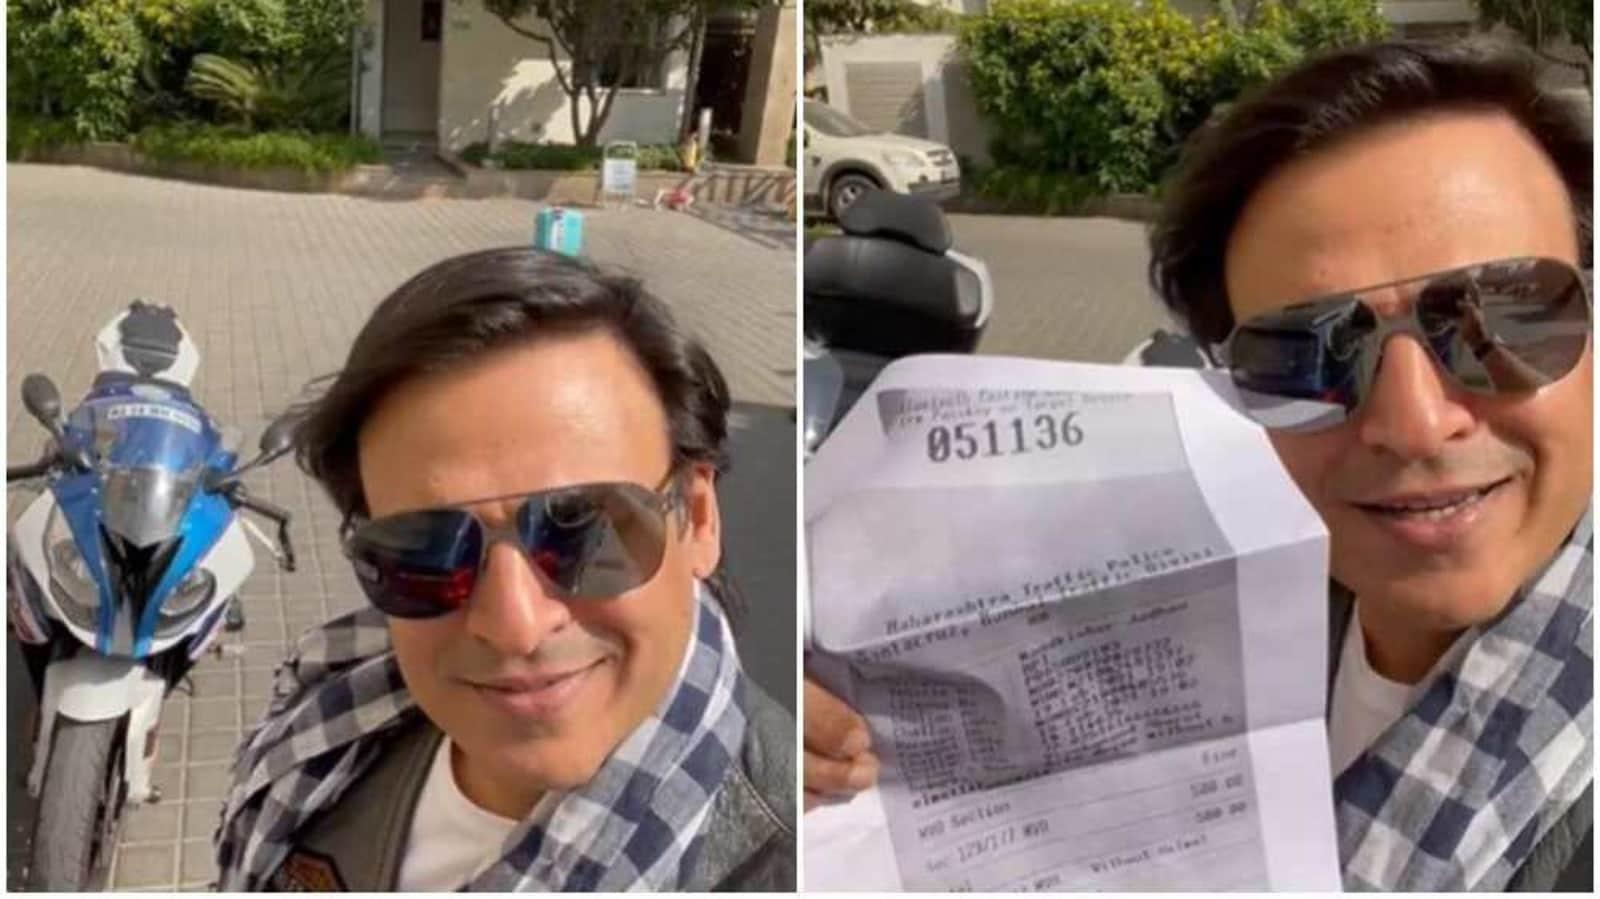 Vivek Oberoi posts hilarious 'Pawri Hori Hai' video with an e-challan for riding bike without helmet - Hindustan Times